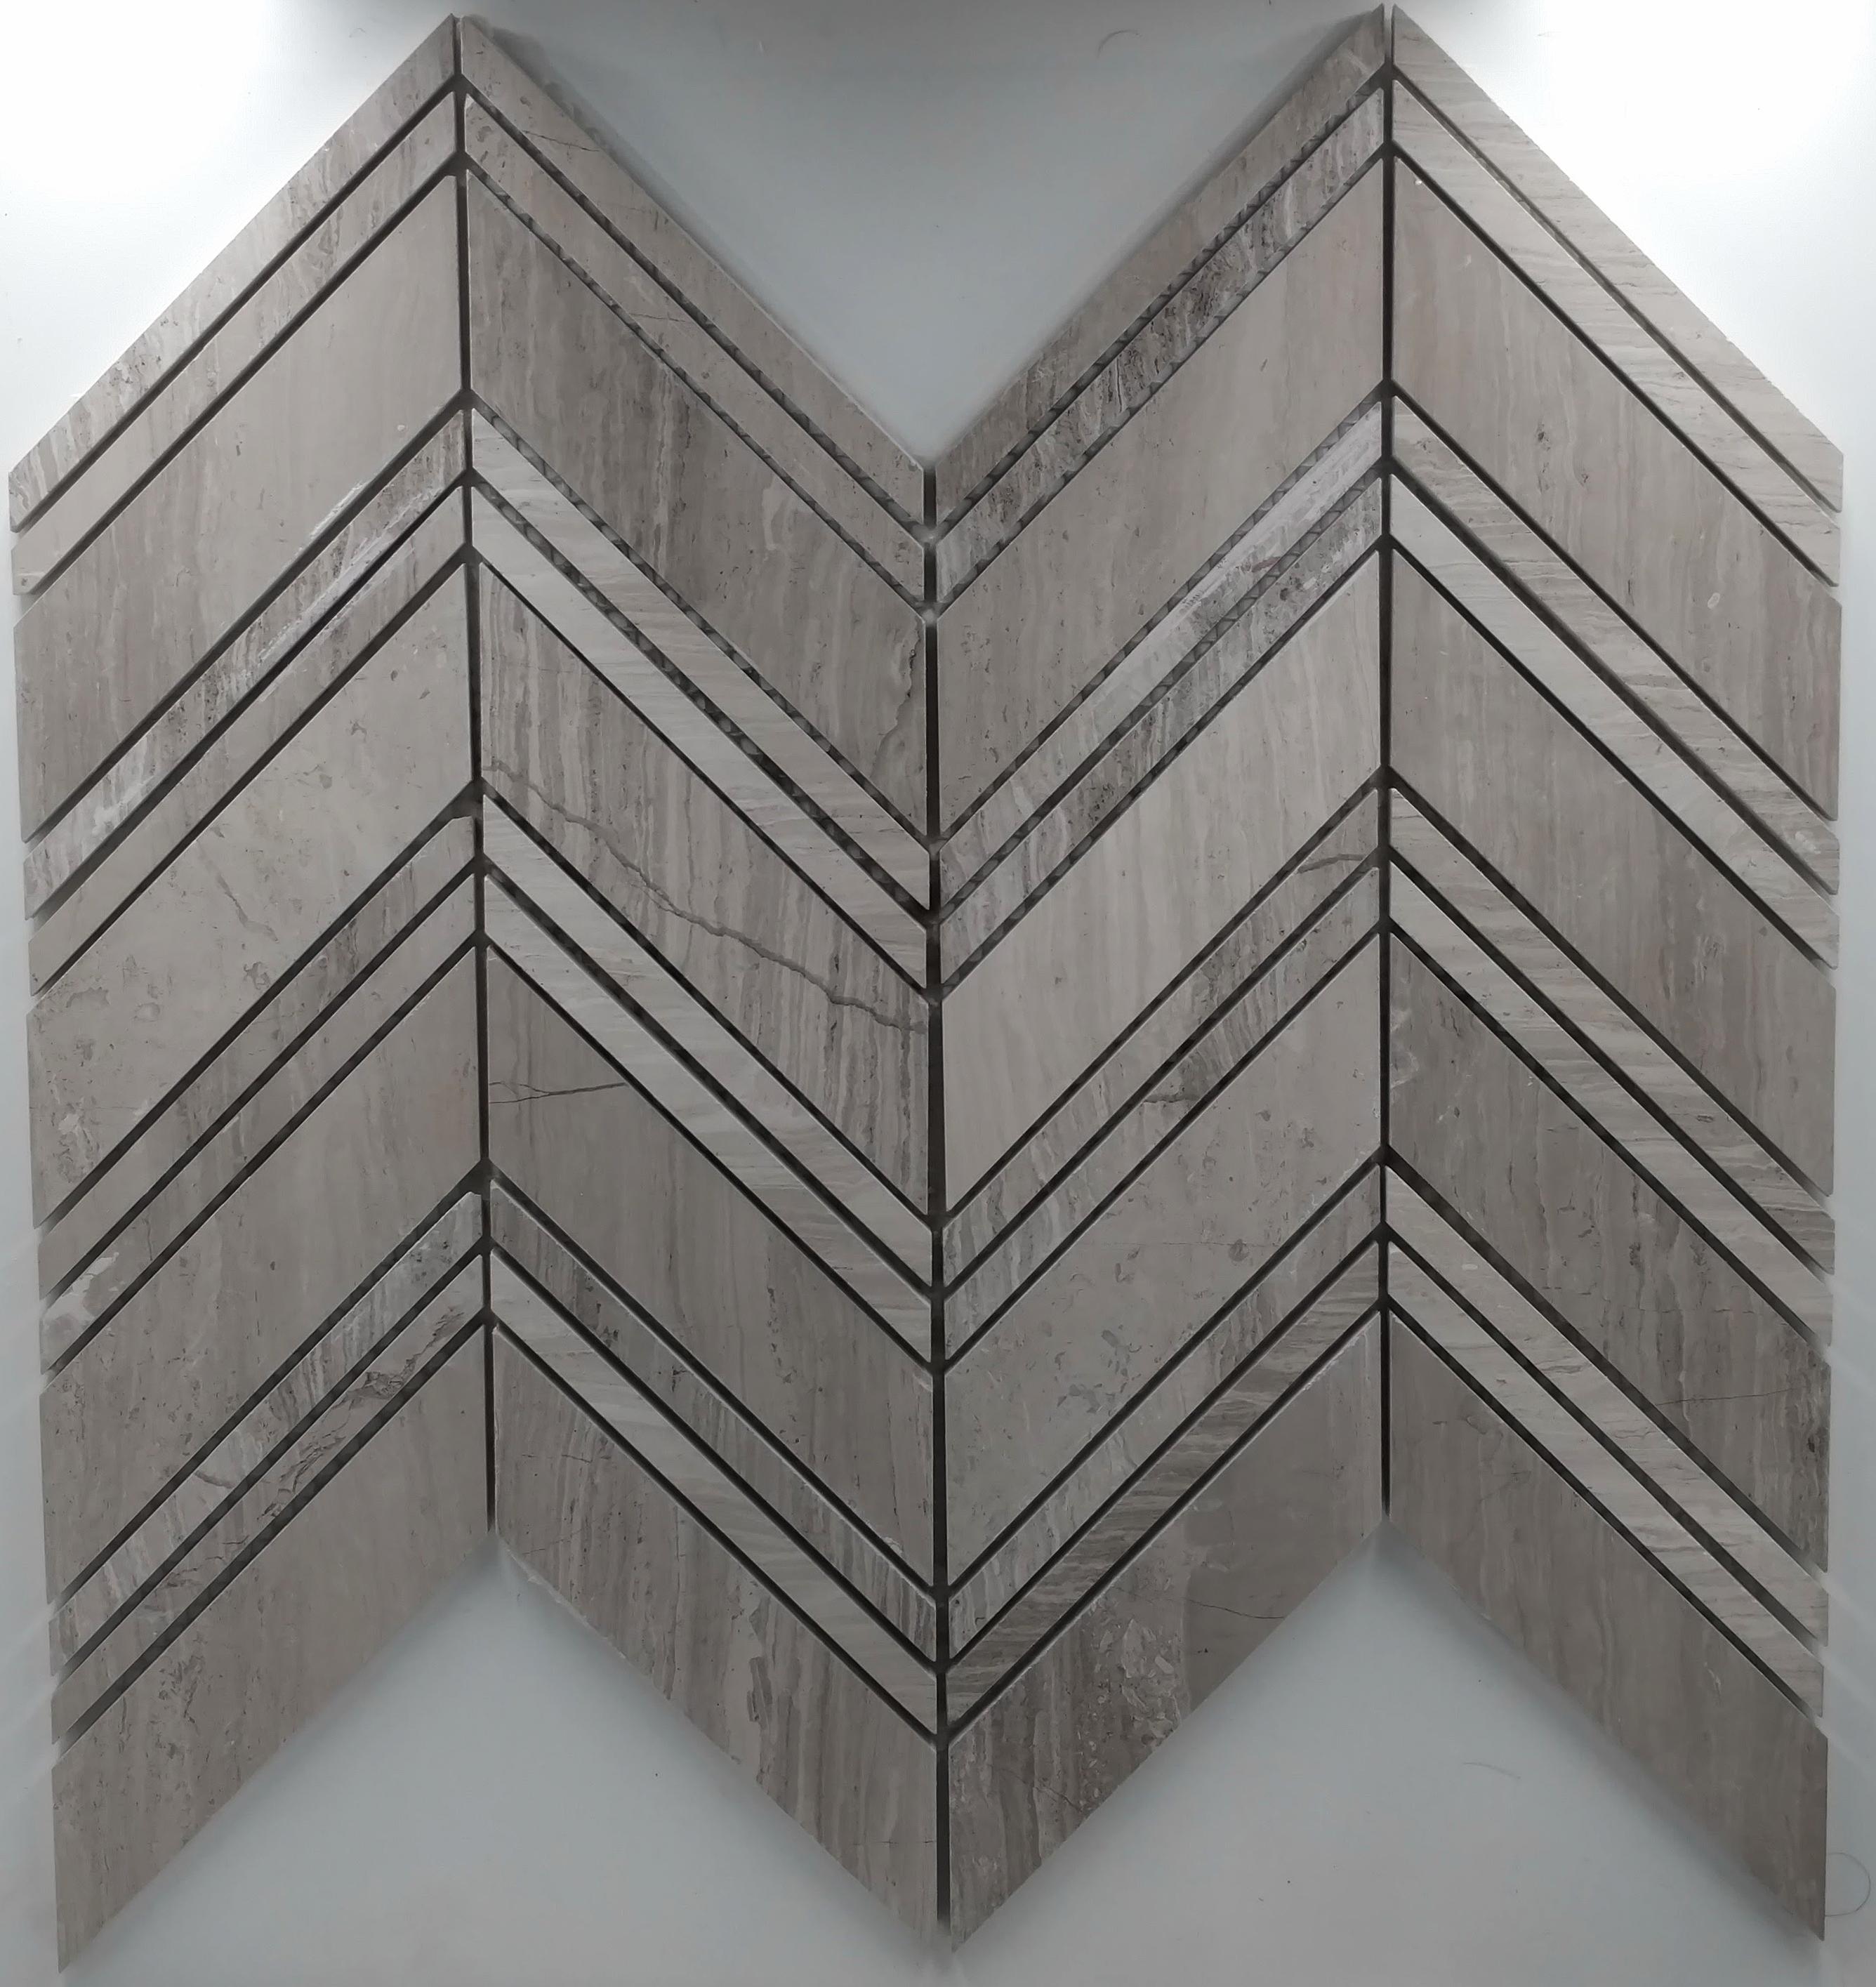 Peak and valley white vein bella casa tile collection for Bella casa tiles